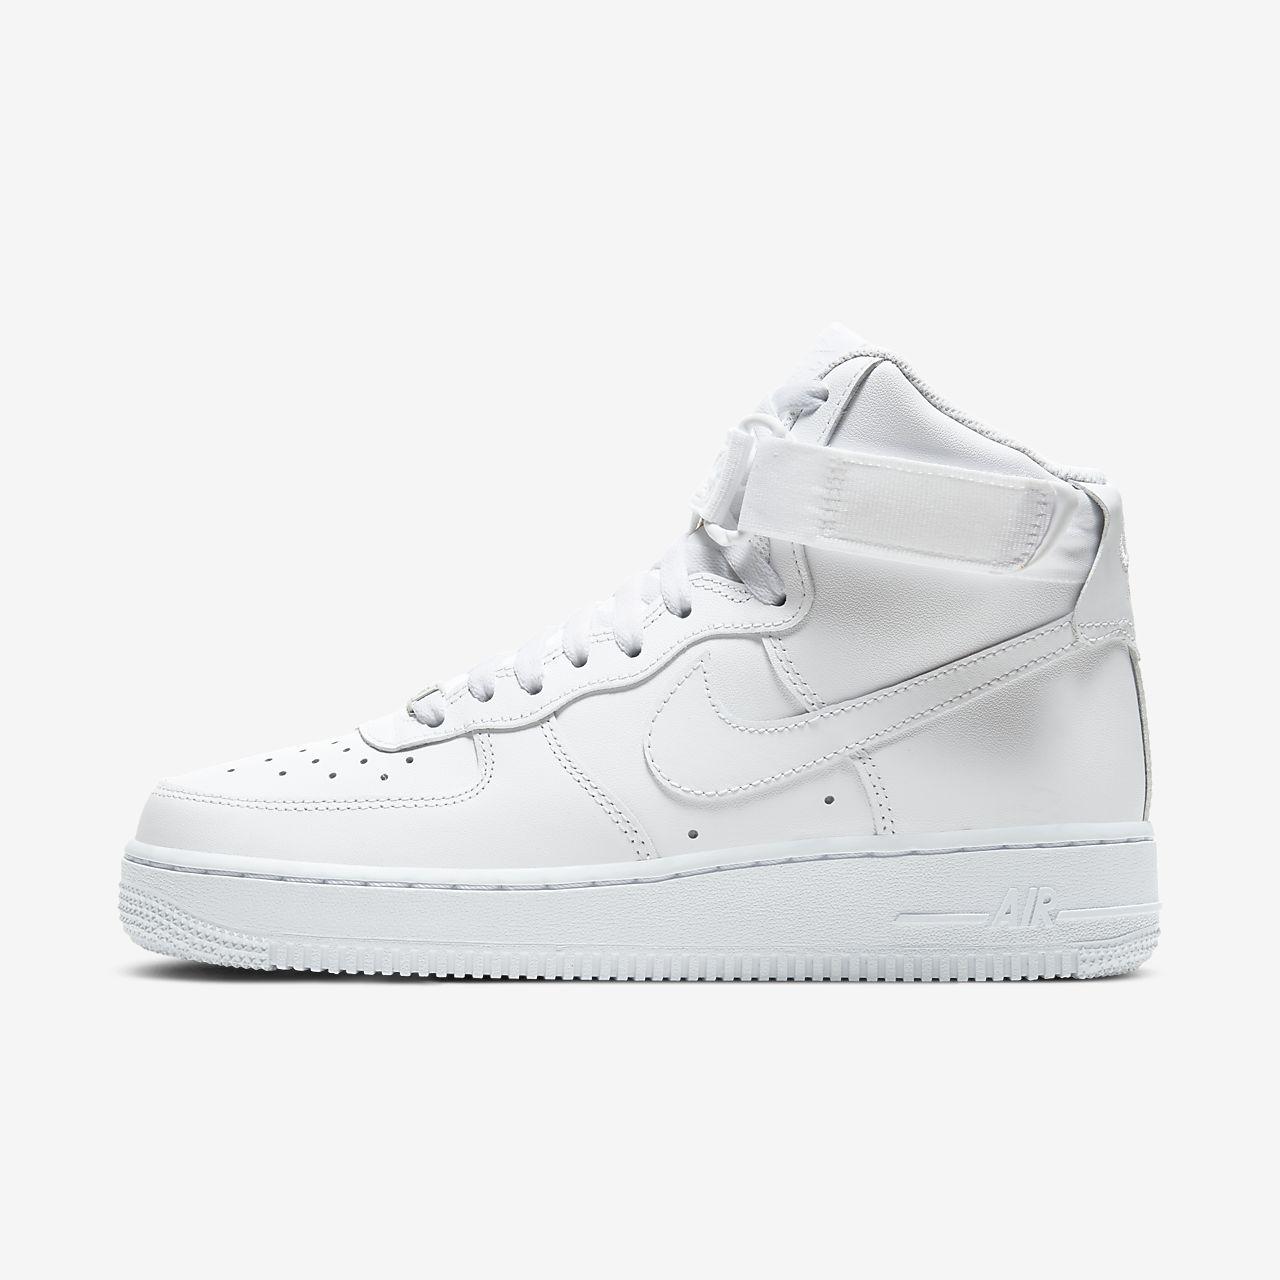 timeless design ef6d9 f6045 ... Calzado para mujer Nike Air Force 1 High 08 LE